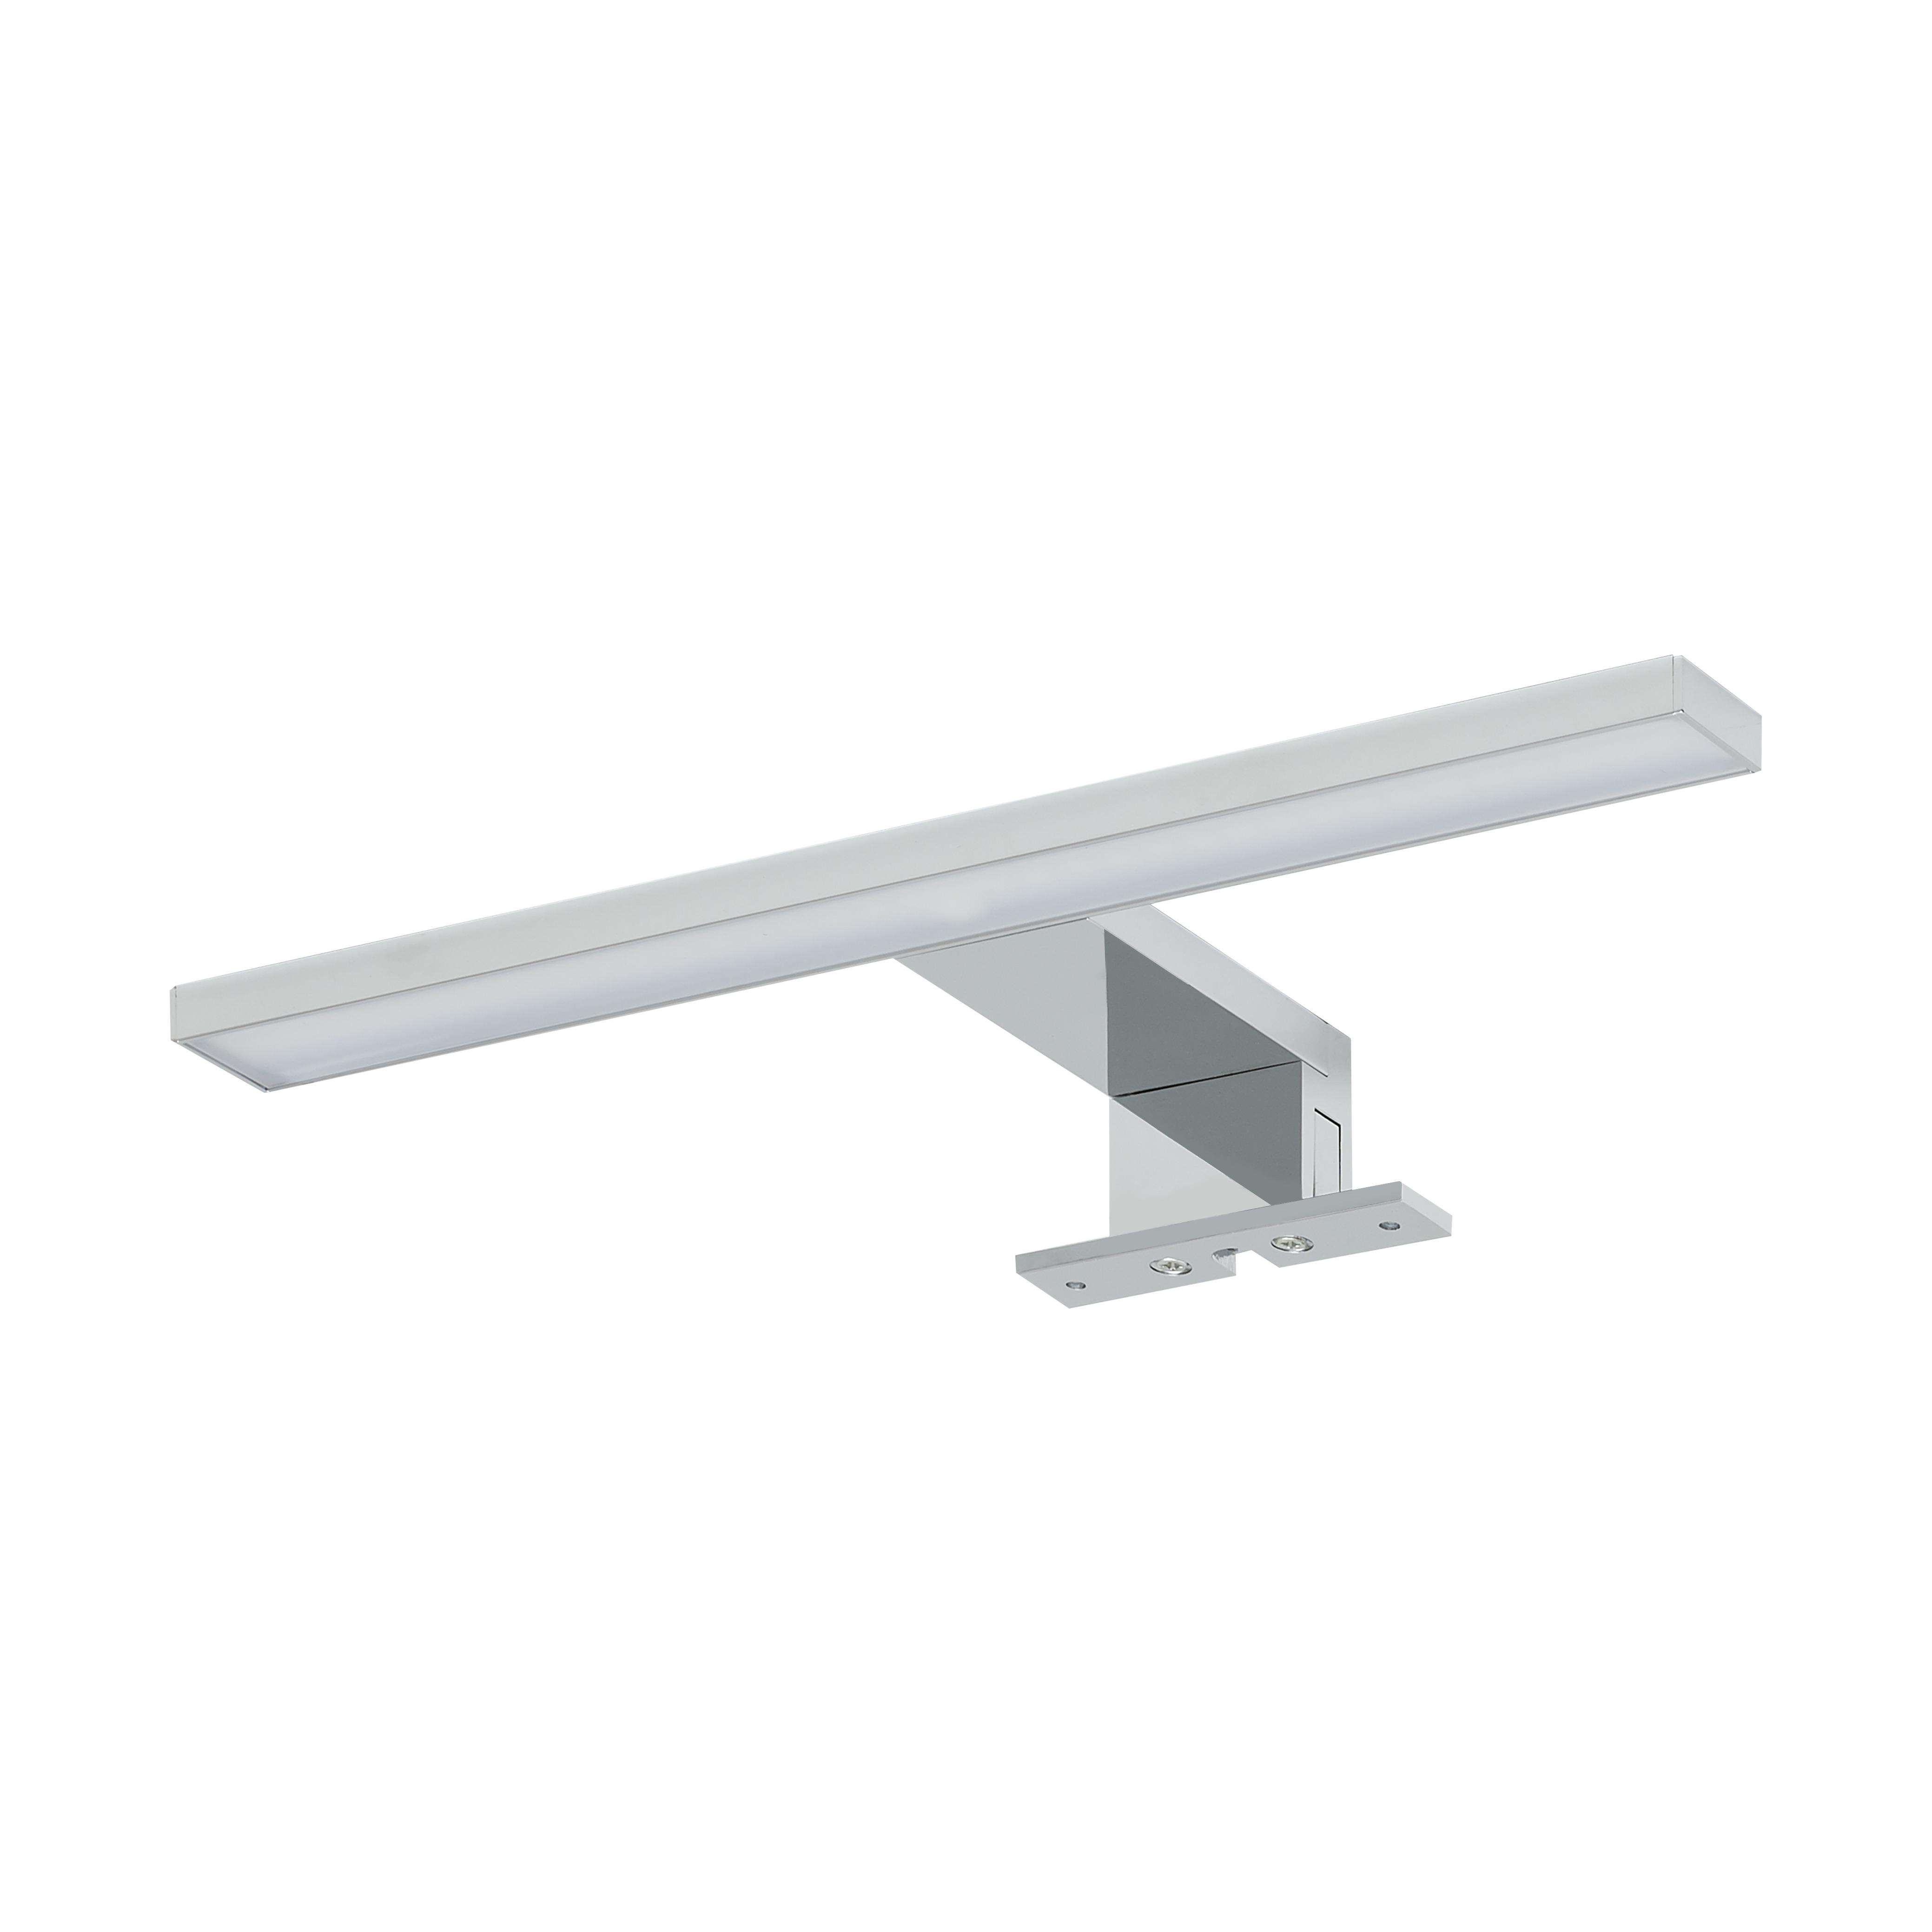 Aurel 30cm LED-verlichting